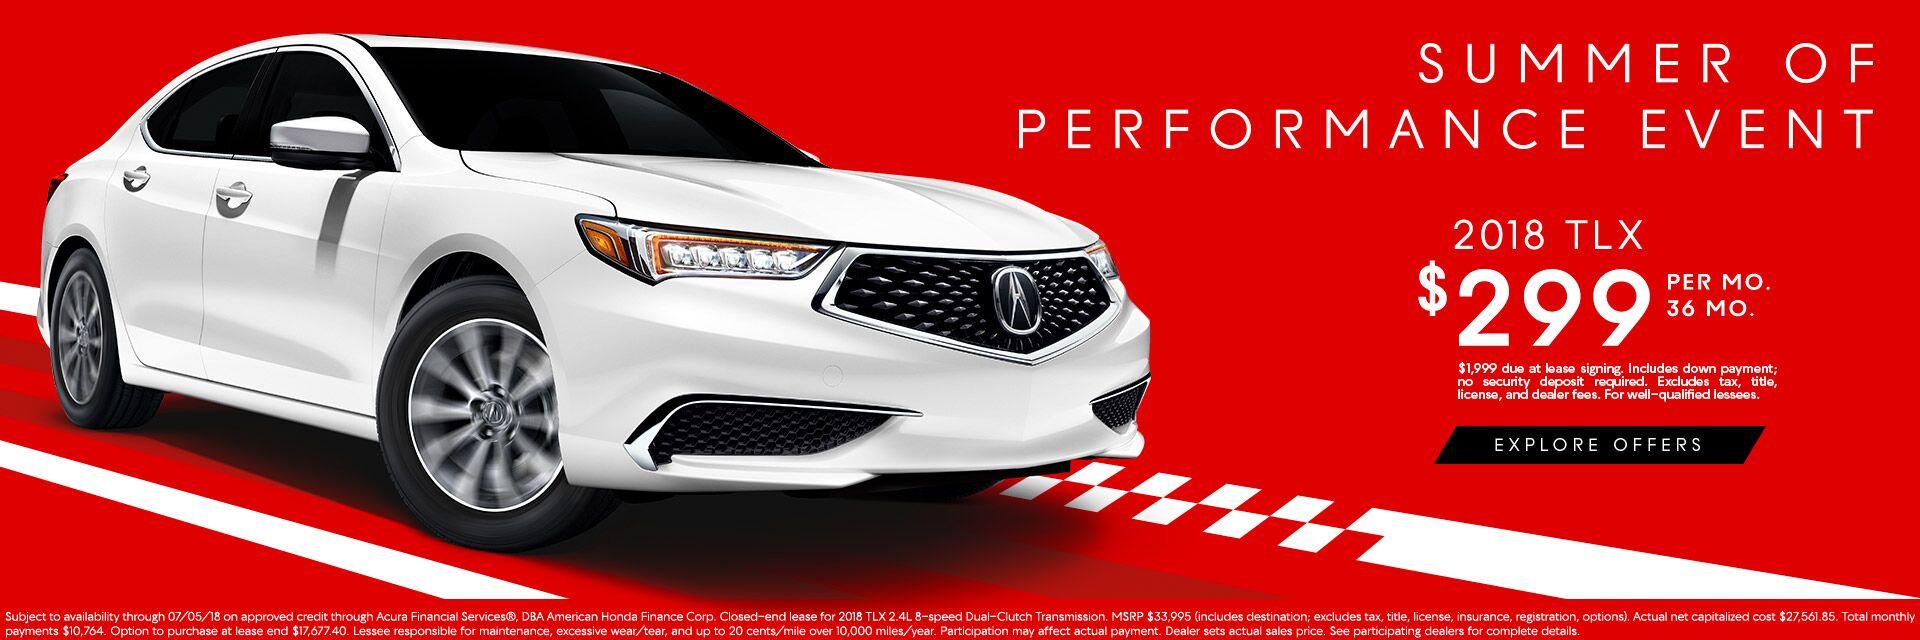 Acura Dealership Modesto CA | Used Cars Acura of Modesto on jaguar sales event, gmc sales event, mitsubishi sales event, dodge sales event, infiniti sales event, honda sales event, subaru sales event,